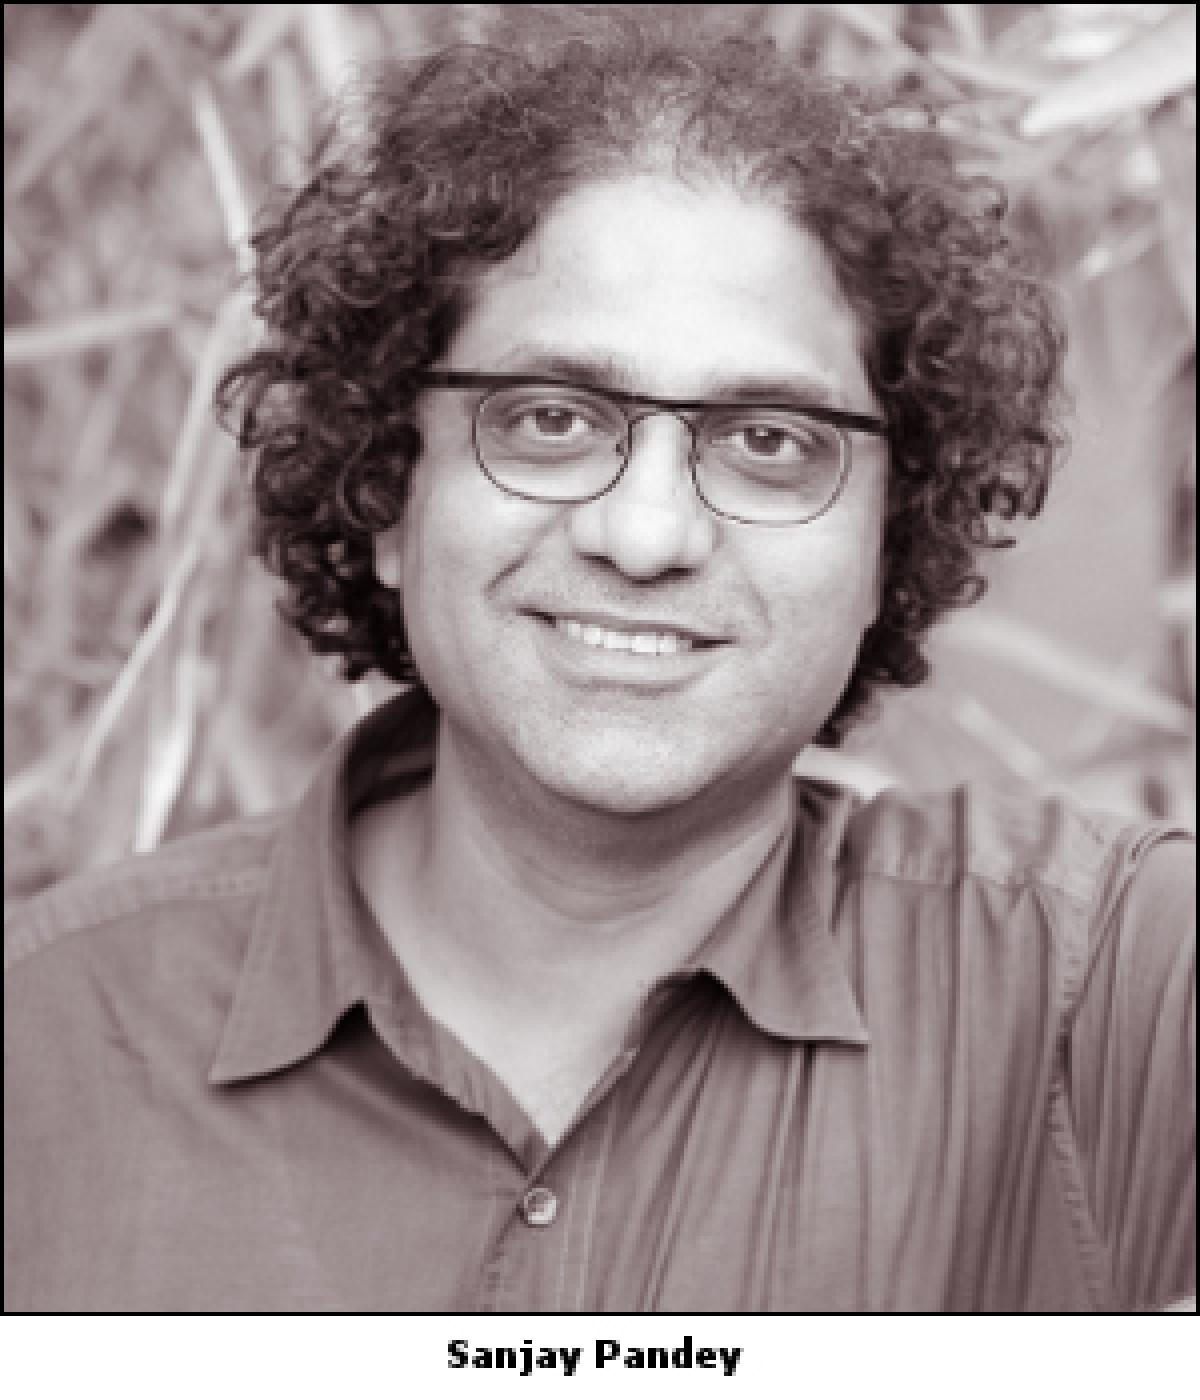 DDB Mudra's Sanjay Panday to head Gutenberg Networks India